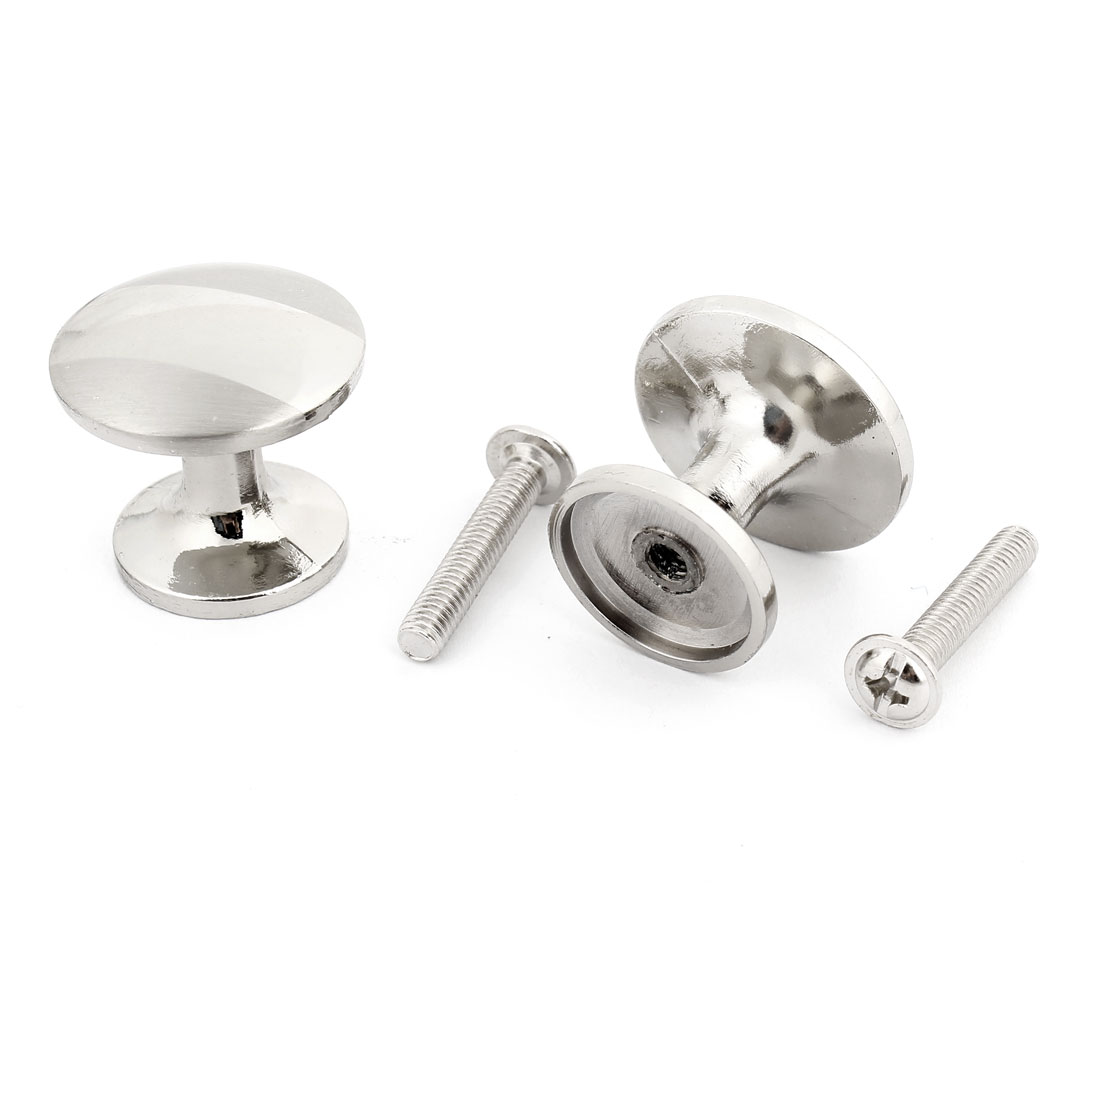 2 Pcs Silver Tone Drawer Fitting 24mm Diameter Pull Handle Metal Round Knob